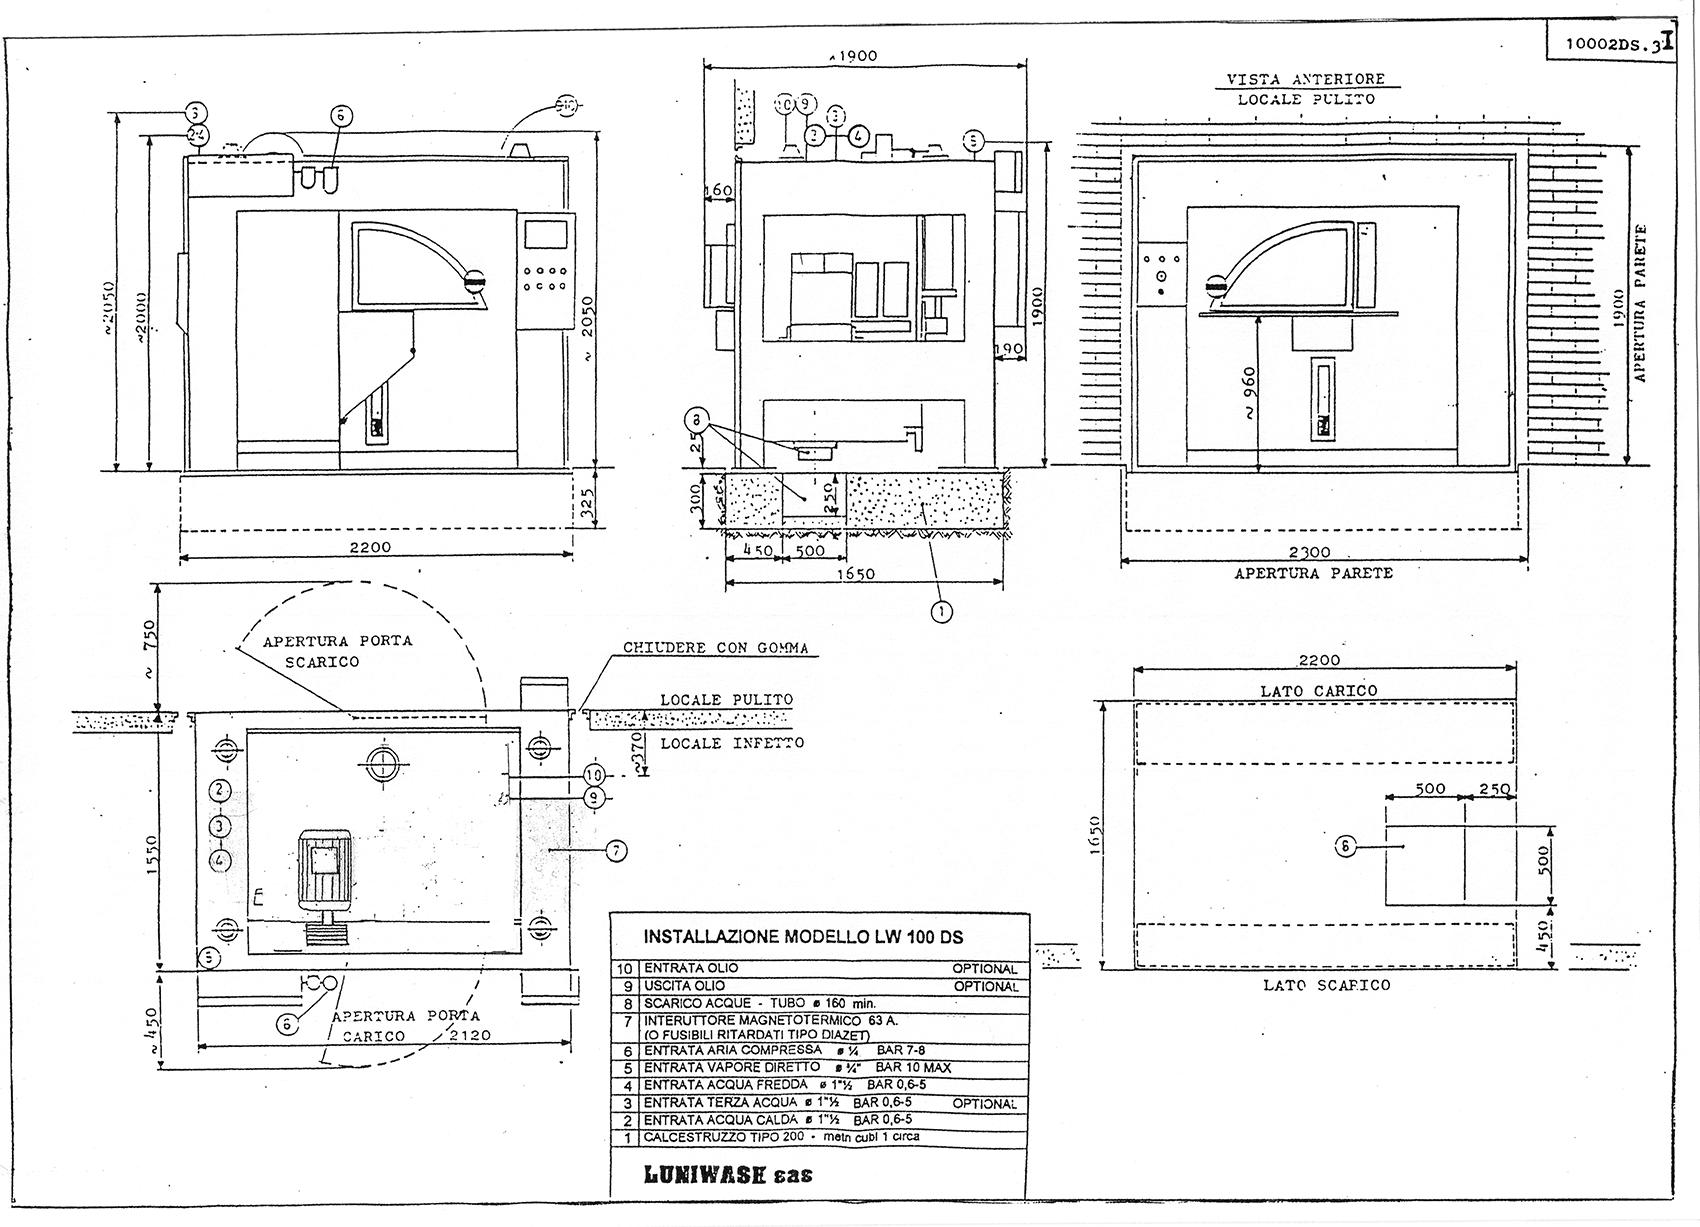 Scheda Tecnica Lavatrice Industriale Lw 100 Ds Luniwash